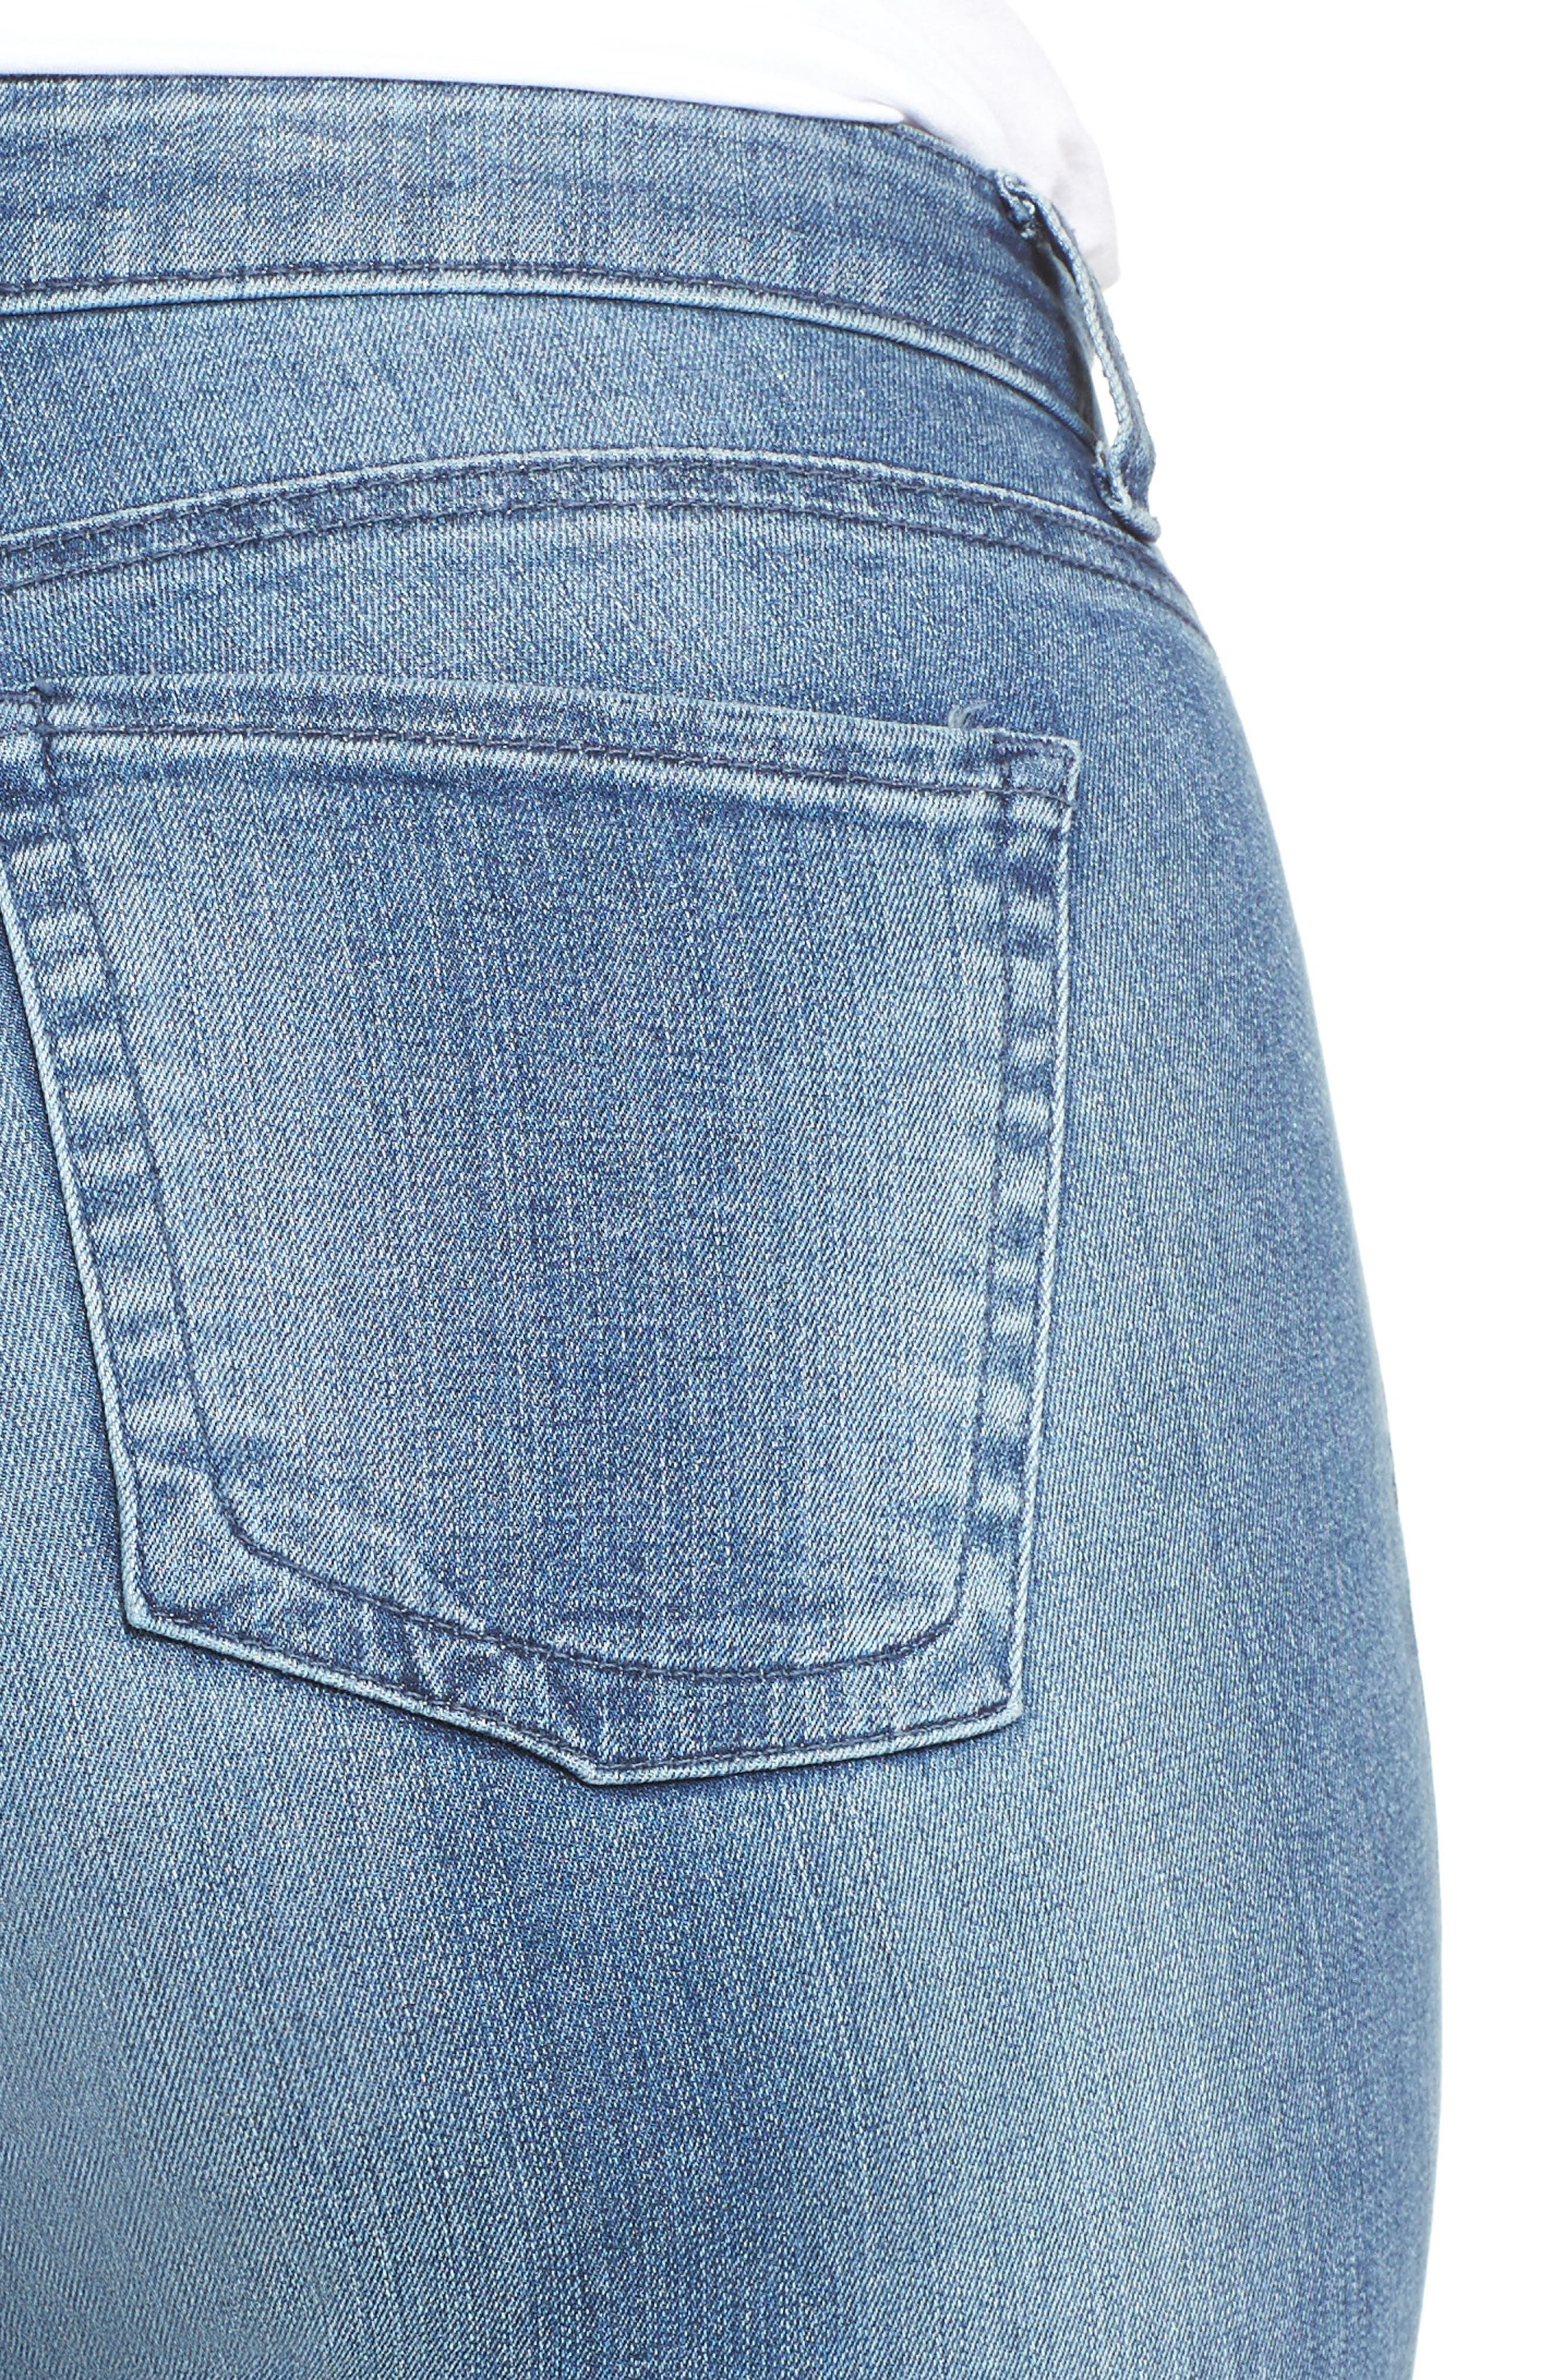 Diana Skinny Jeans,                             Alternate thumbnail 4, color,